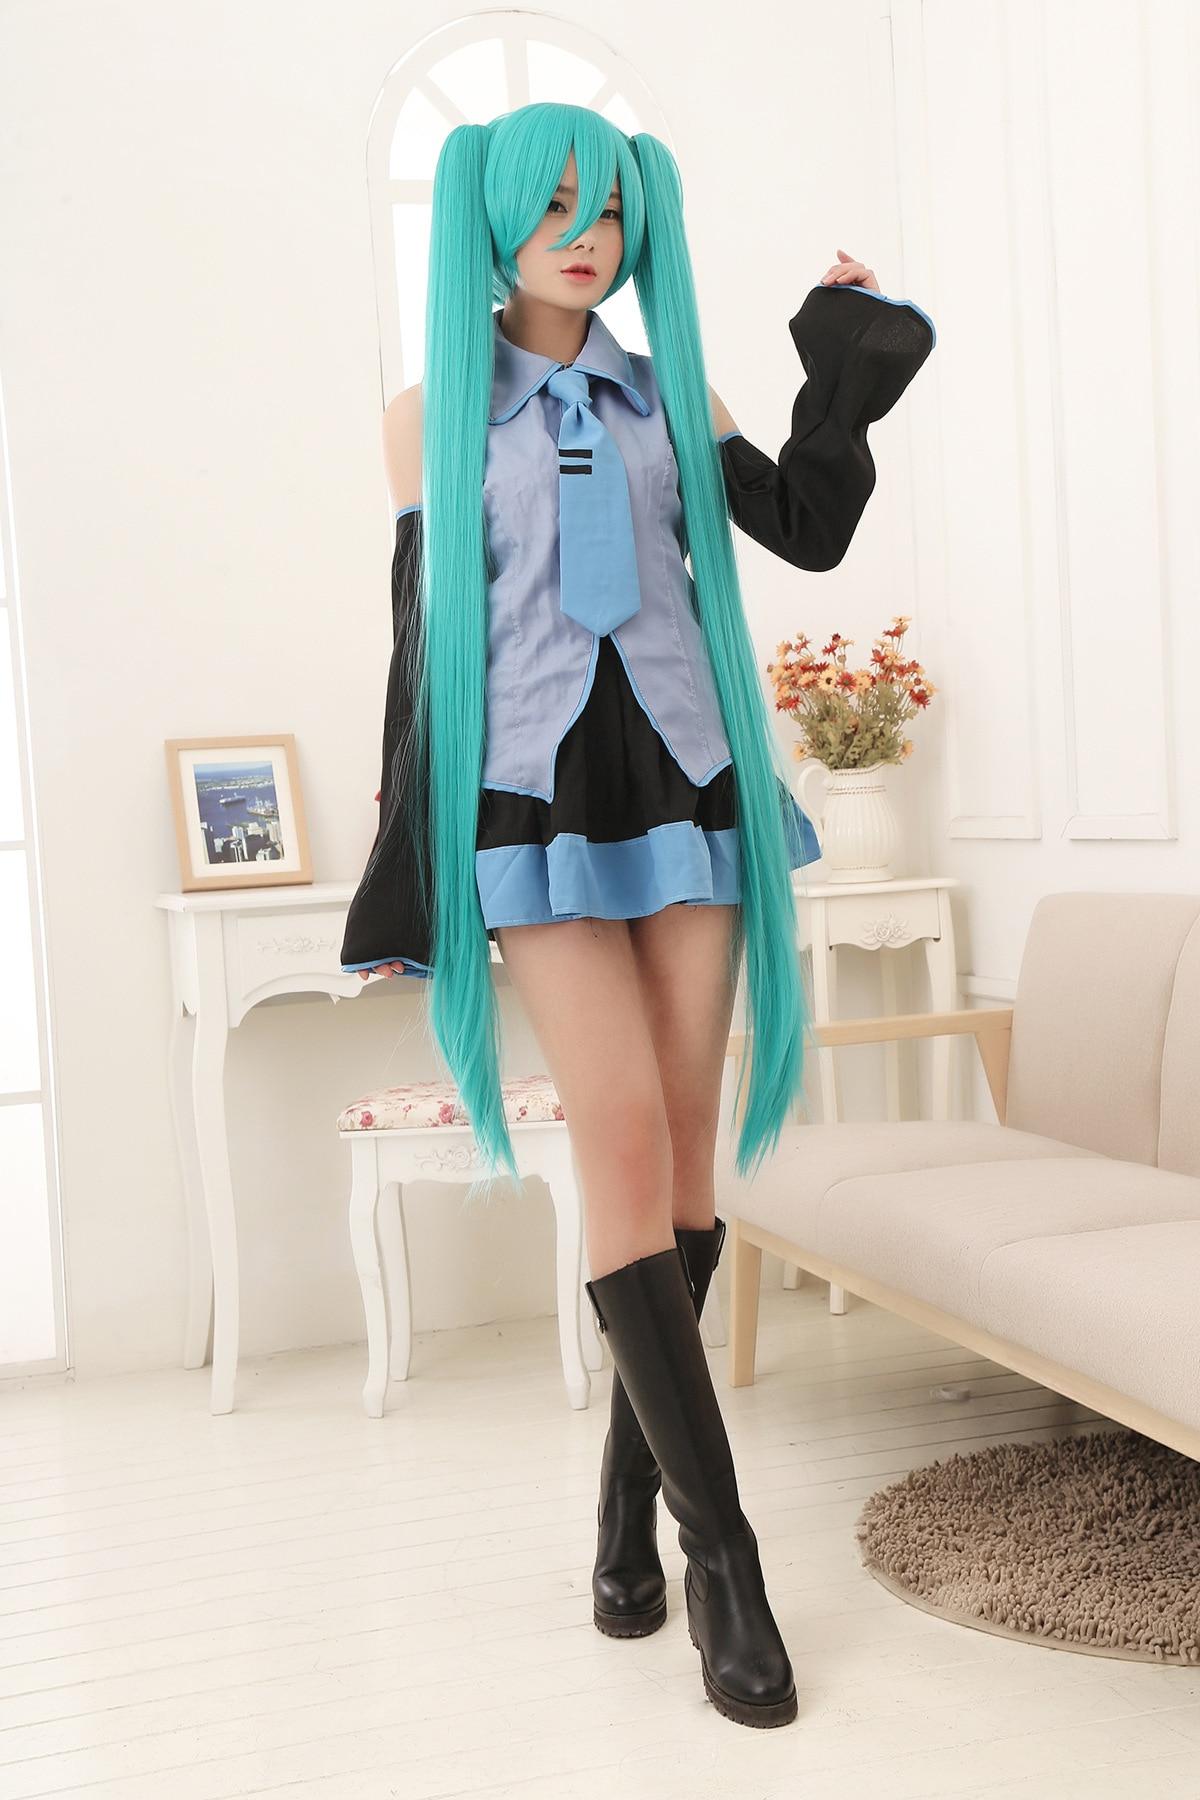 ФОТО Vocaloid Cosplay Hatsune Miku Costume With 130cm Long Miku Cosplay Wig hair Set Free shipping